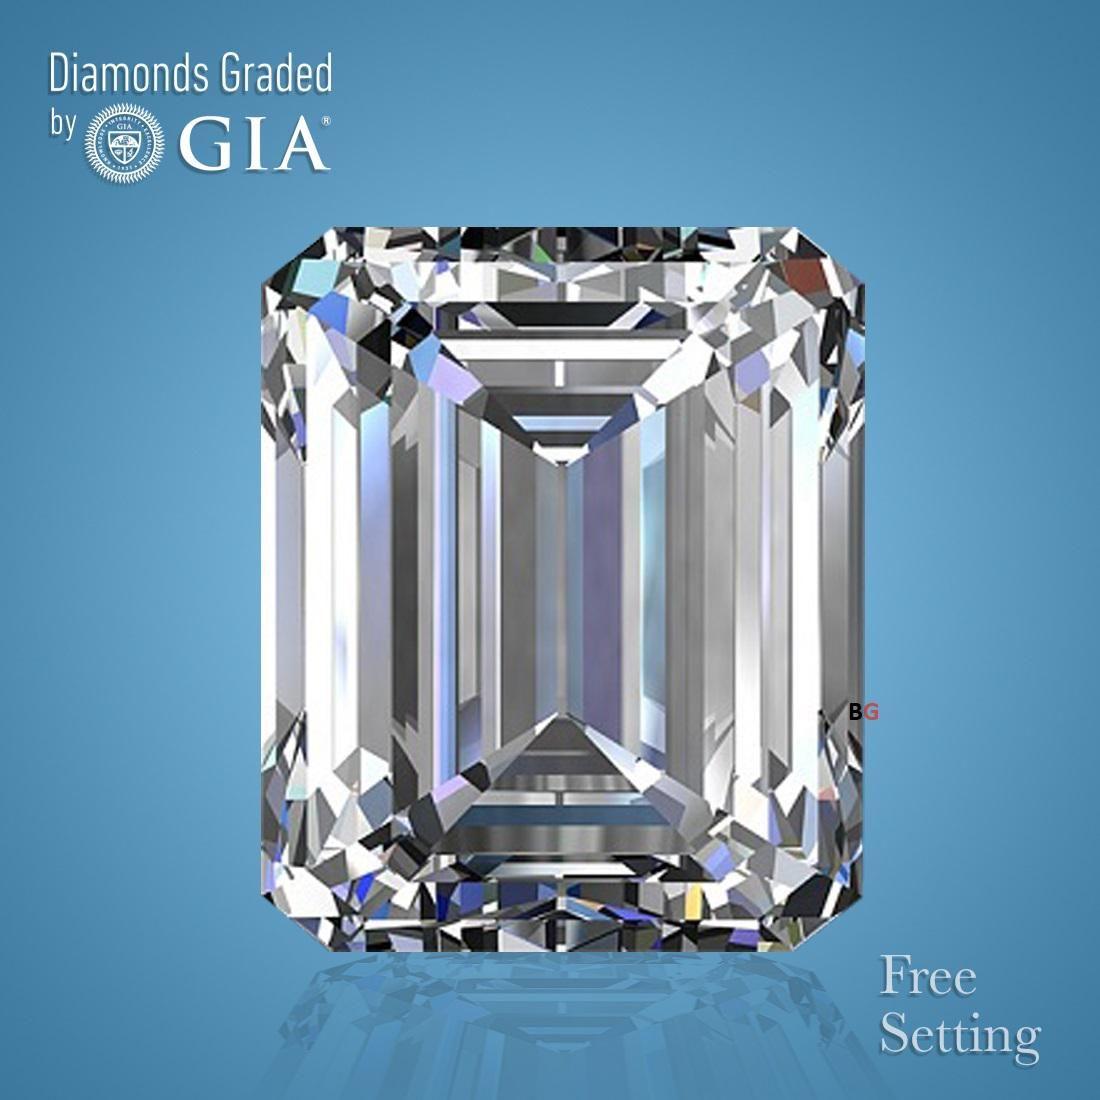 3.02 ct, Color D/VVS2, Emerald cut GIA Graded Diamond